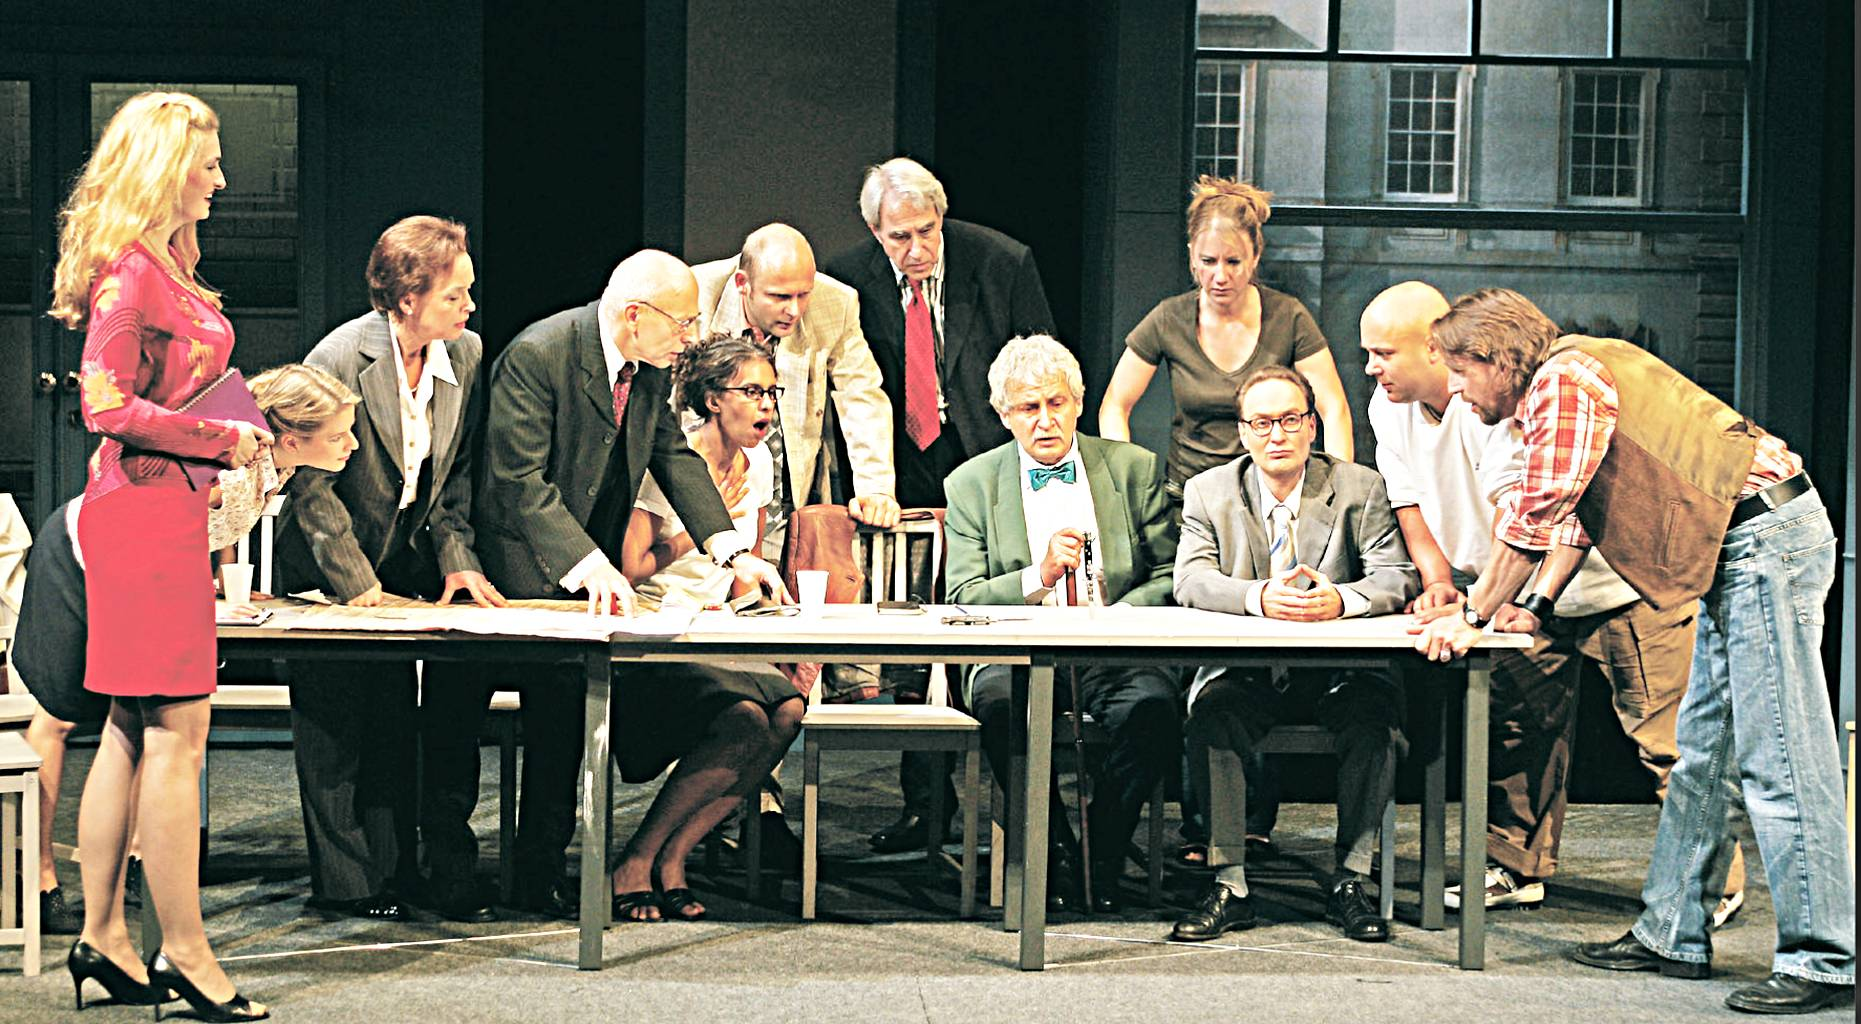 theater-die-12-geschworenen-ausschnitt